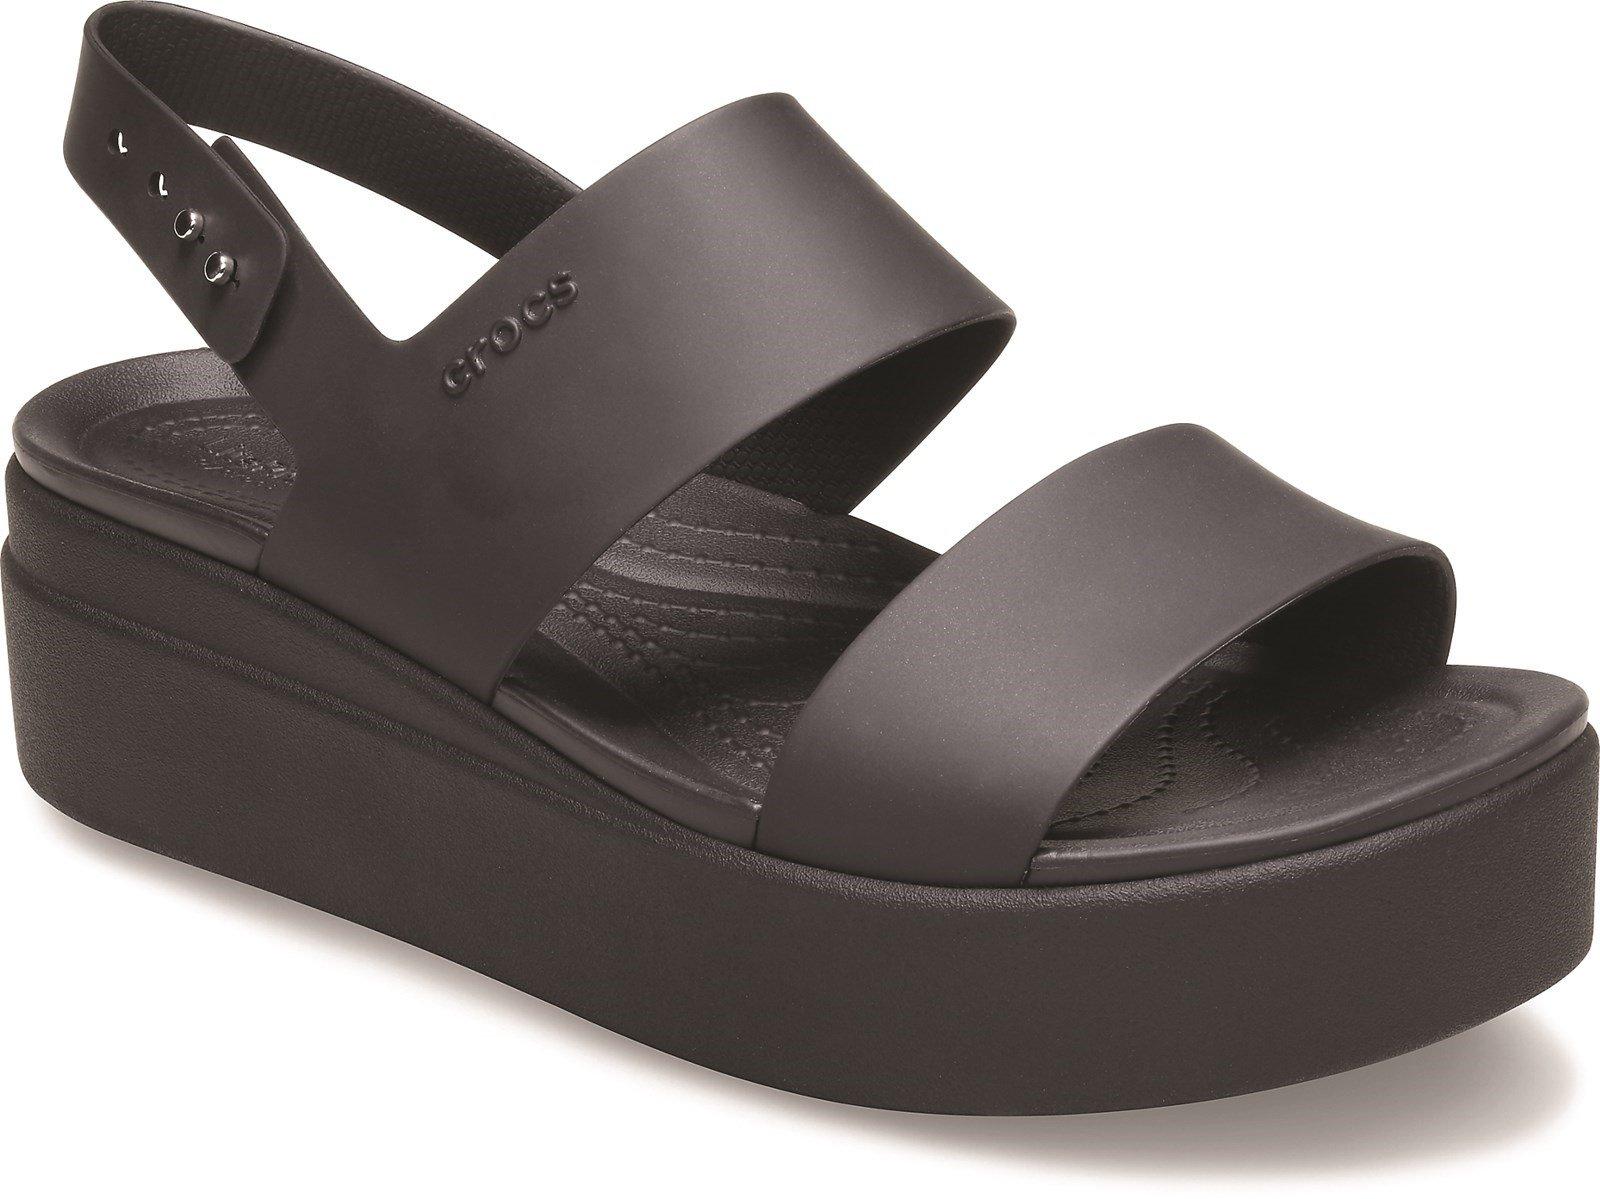 Crocs Women's Brooklyn Low Wedge Platform Sandal Various Colours 31458 - Black 3